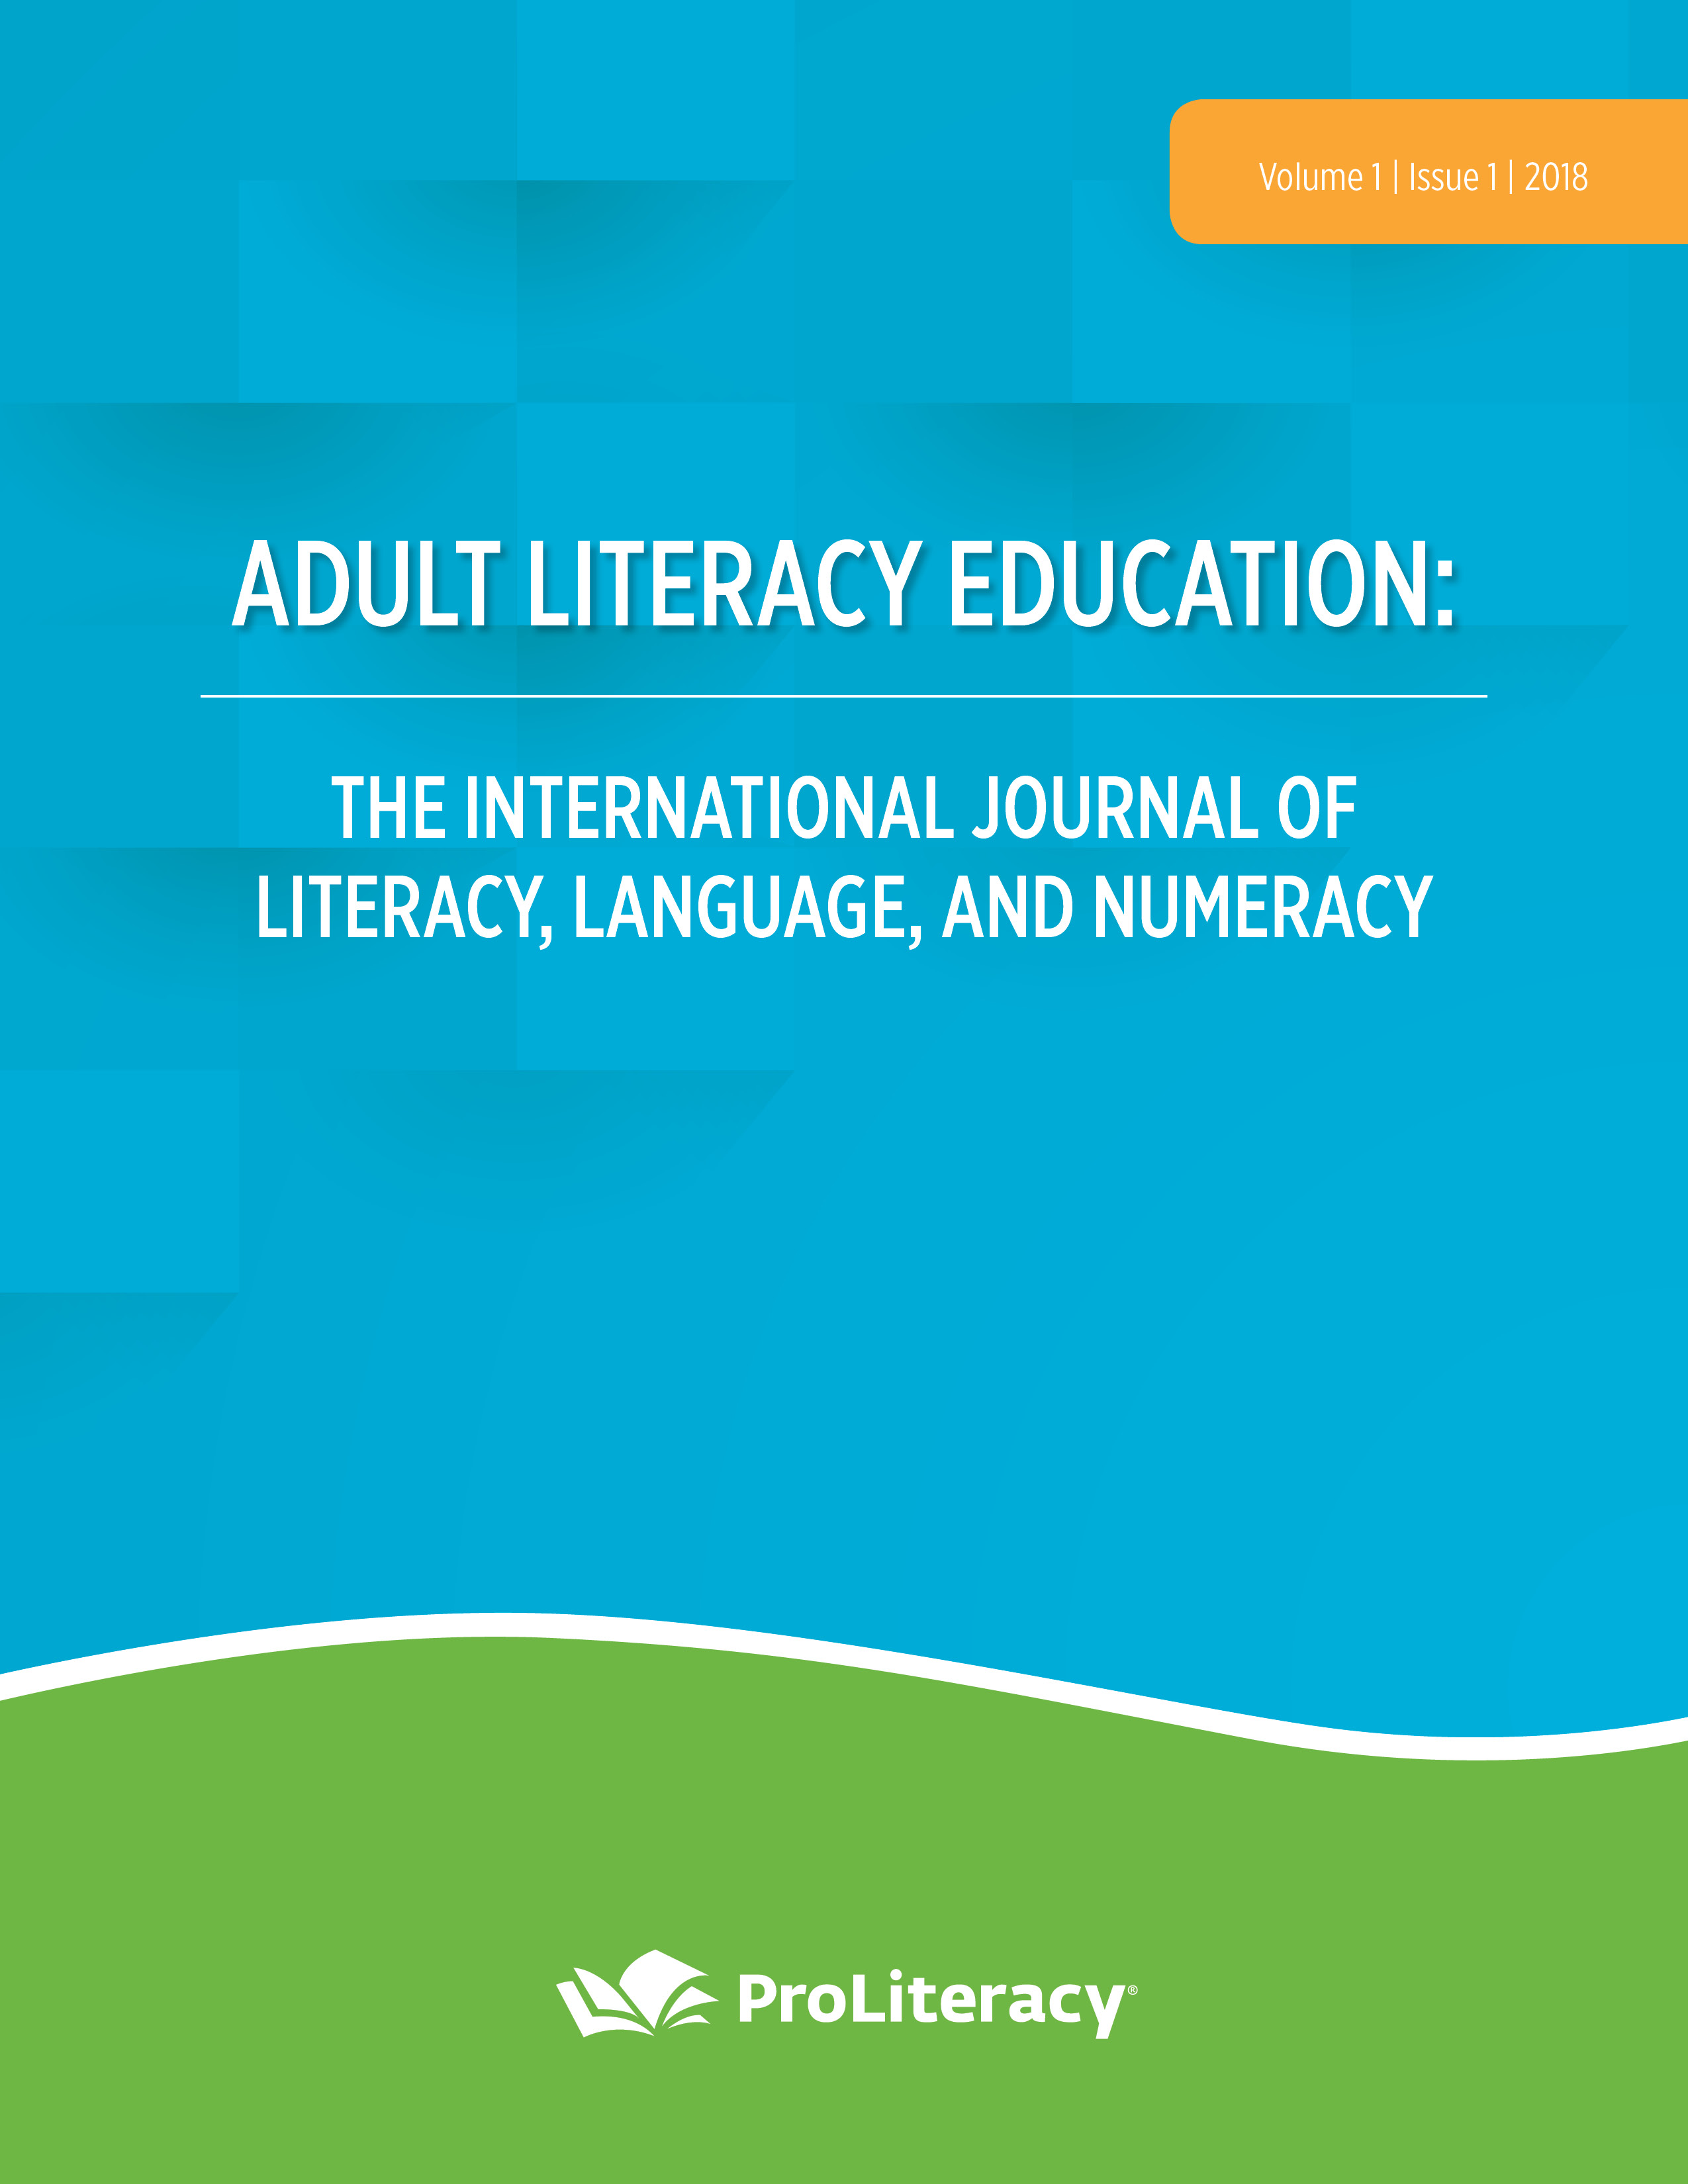 ProLiteracy Adult Literacy Education Journal